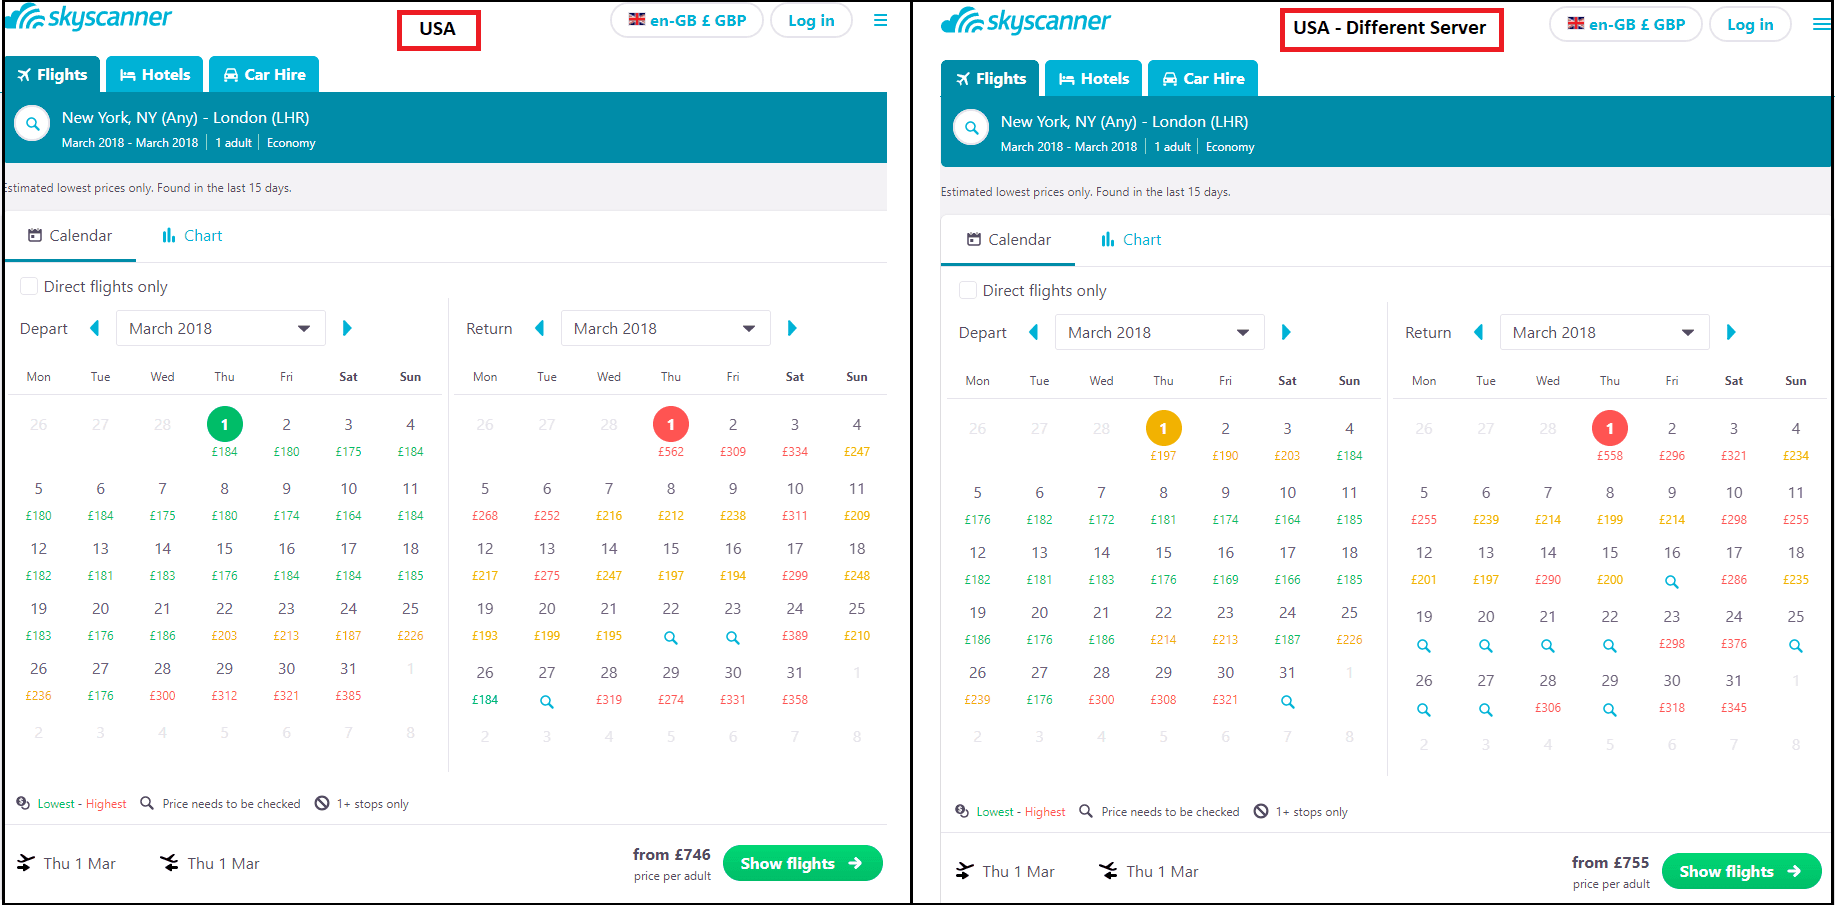 comparing_2_usa_servers